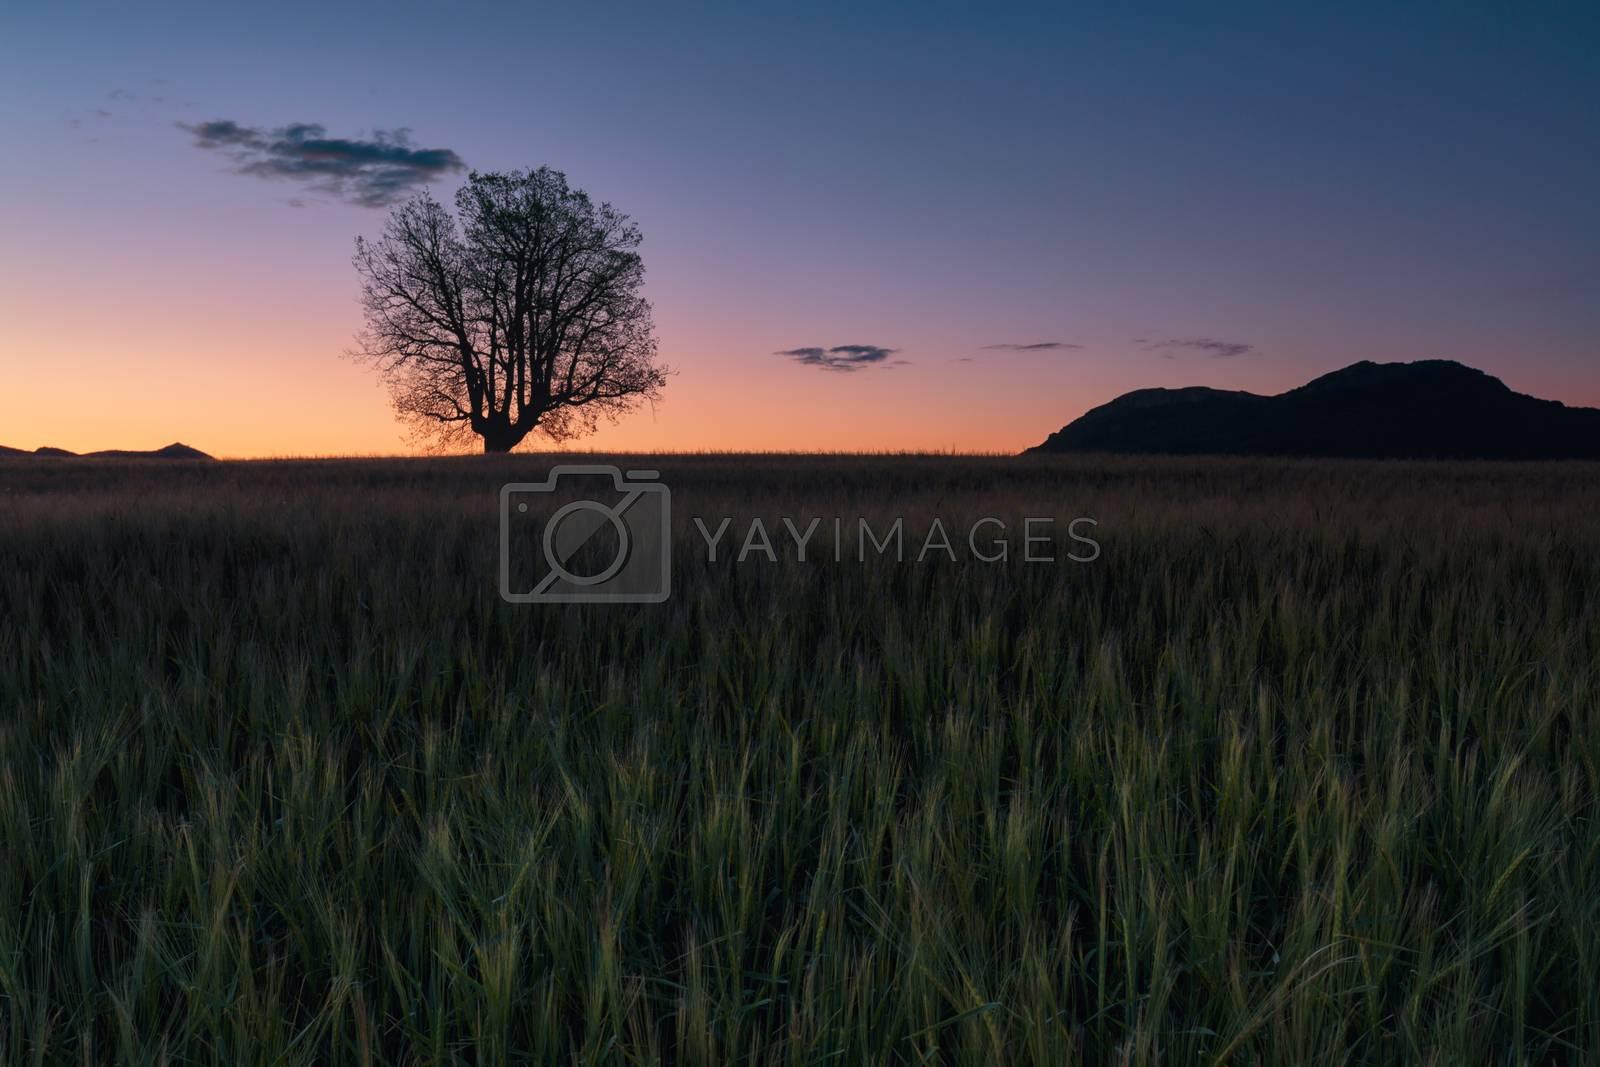 Green barley field ans a lonely oak at sunrise